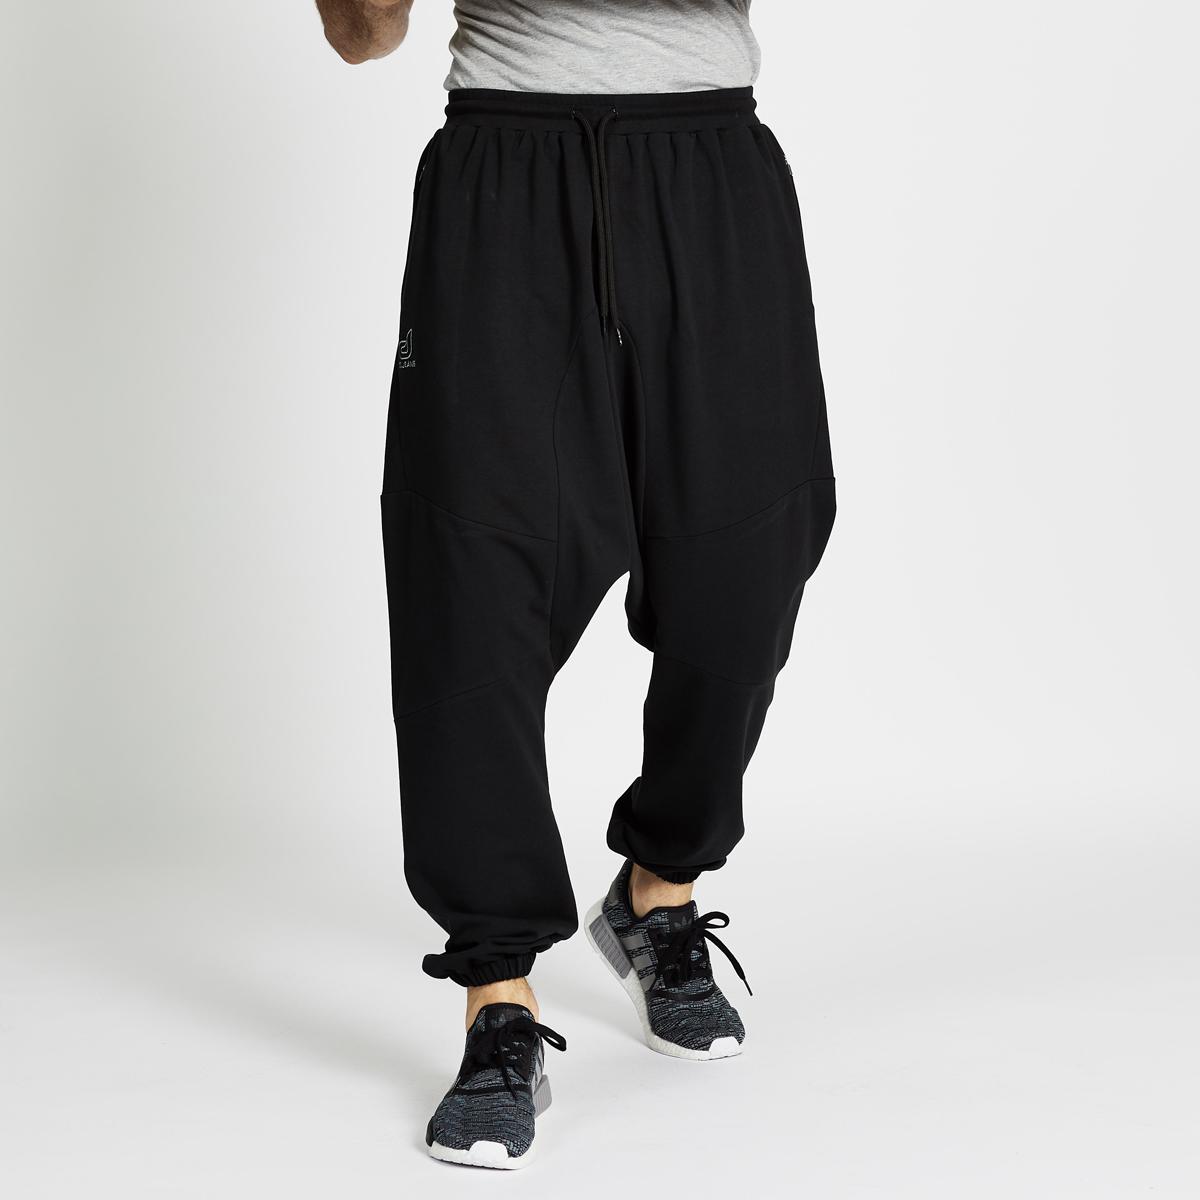 Saroual Jogging NOIR evo long S18 - DCJeans ® - sarouel   clothing ... b10ec159eb3